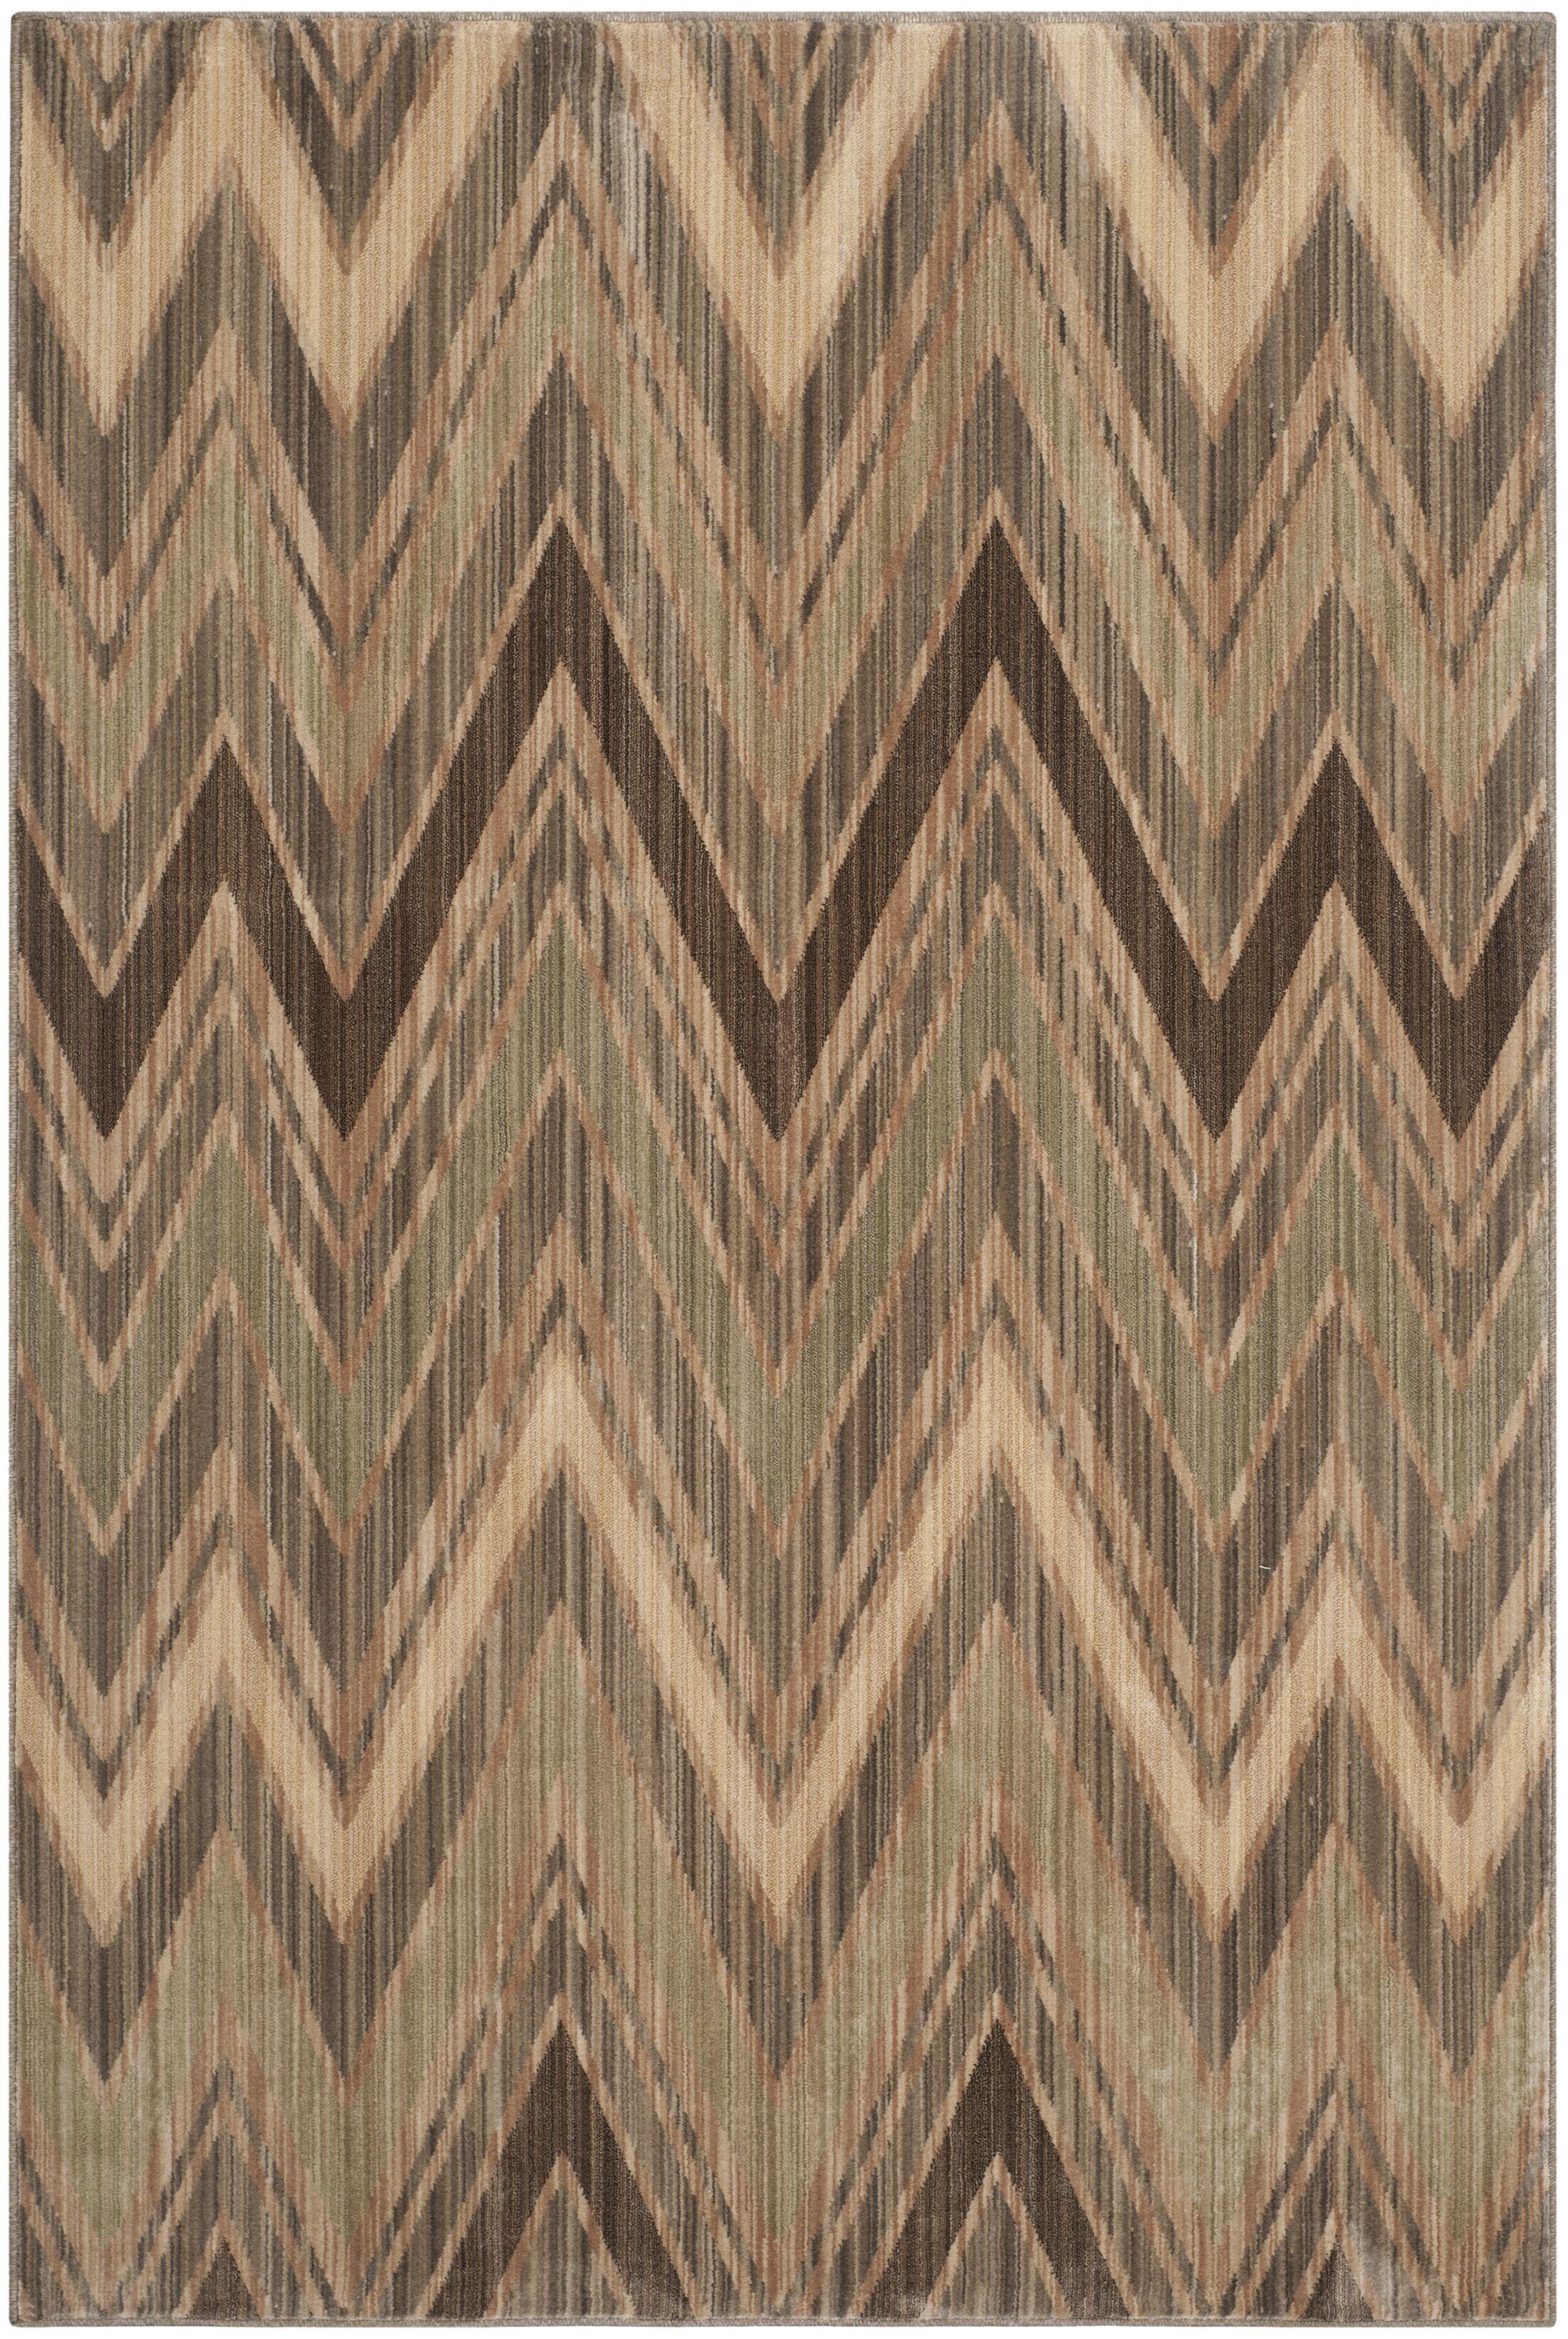 Infinity Chevron Taupe/Beige Area Rug Rug Size: Rectangle 8' x 10'